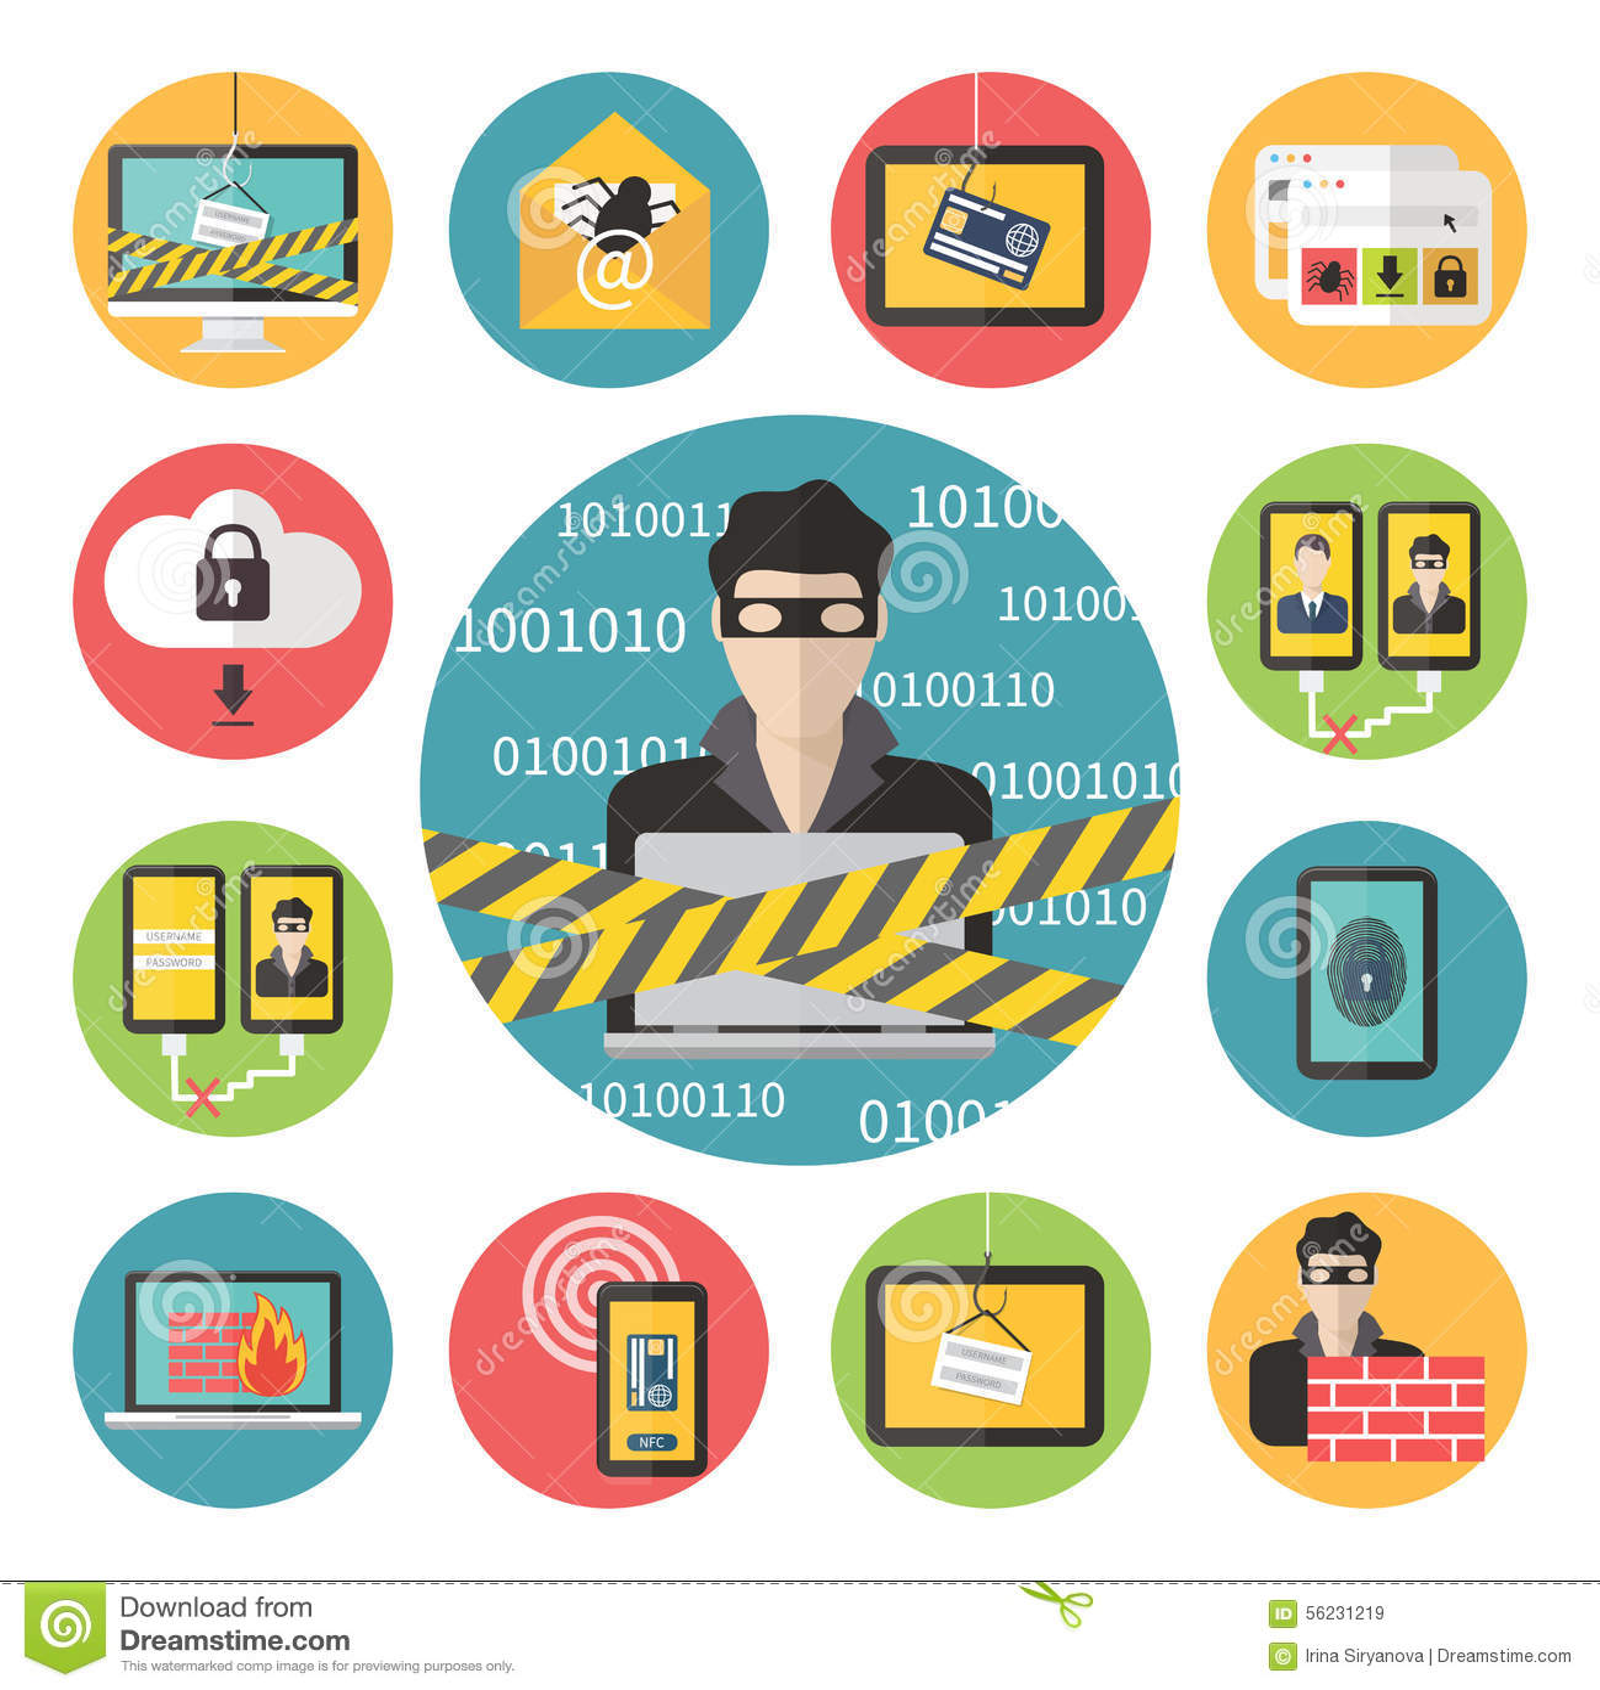 Viral Times Web: Internet Web Security. Stock Illustration. Image Of